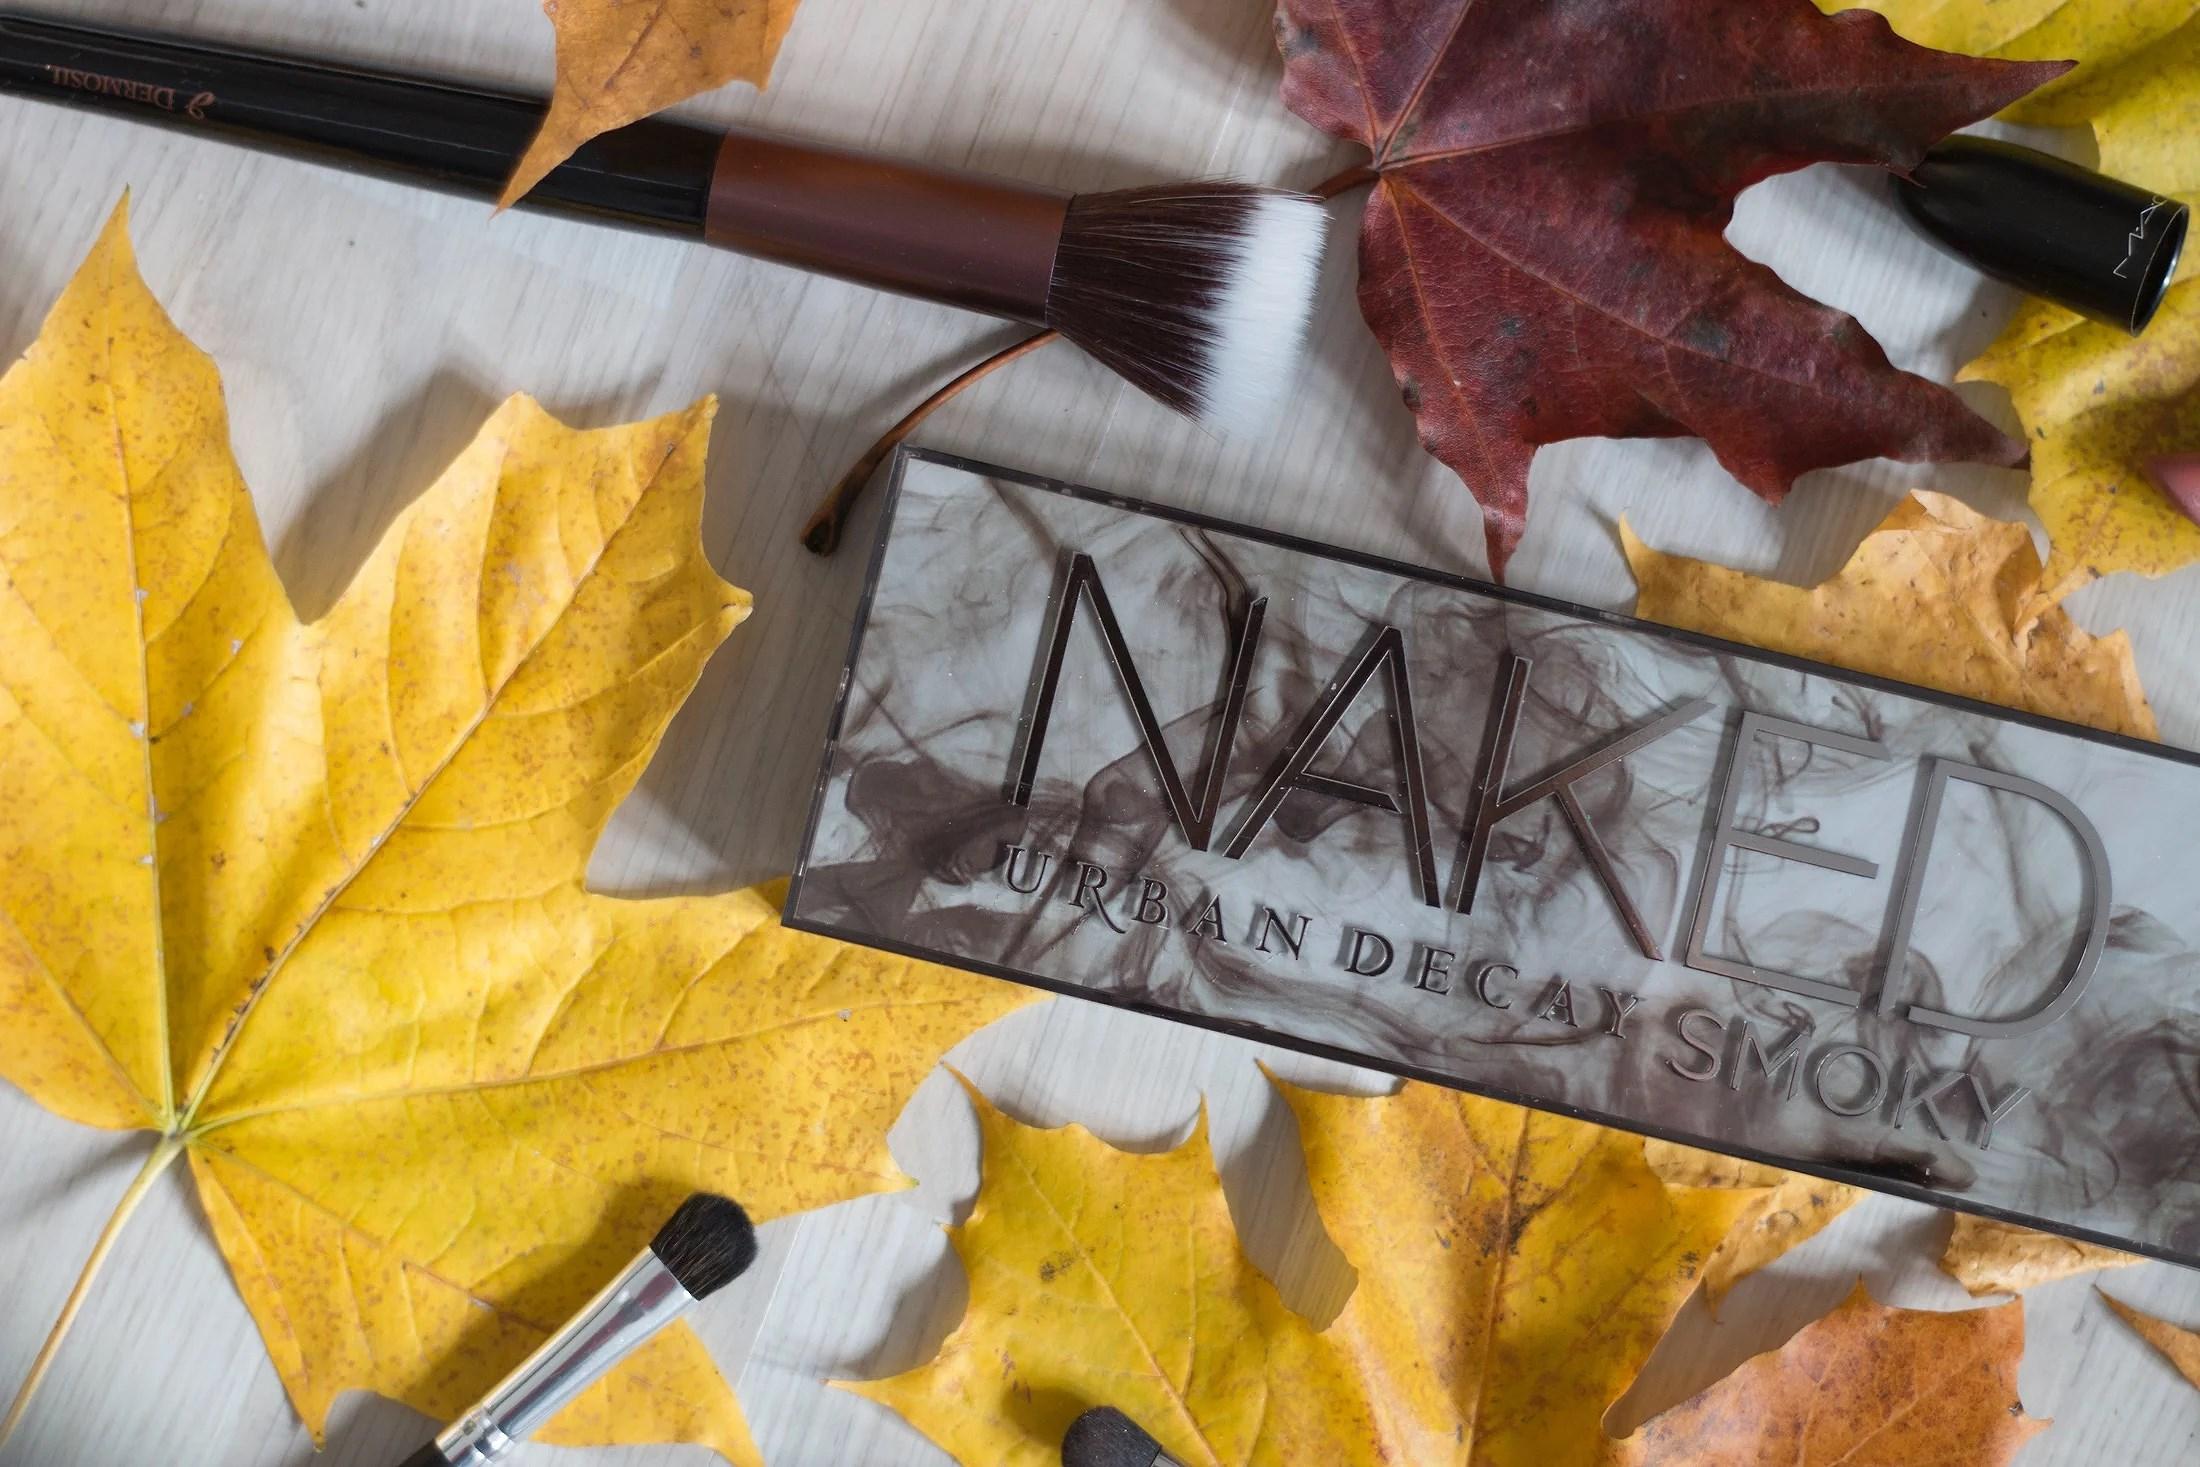 Urban Decay - Naked Smoky Palette